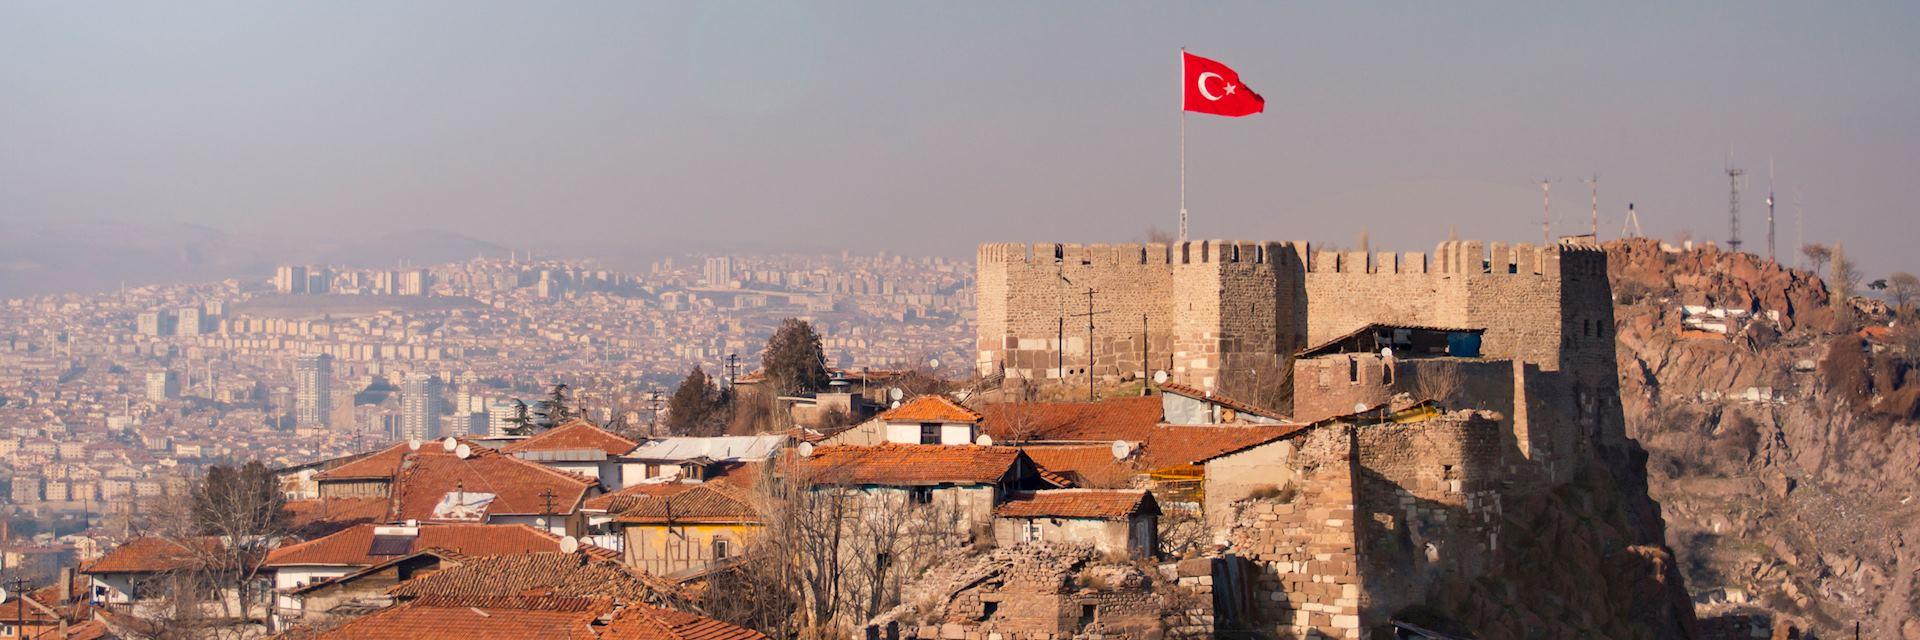 Ankara citadel